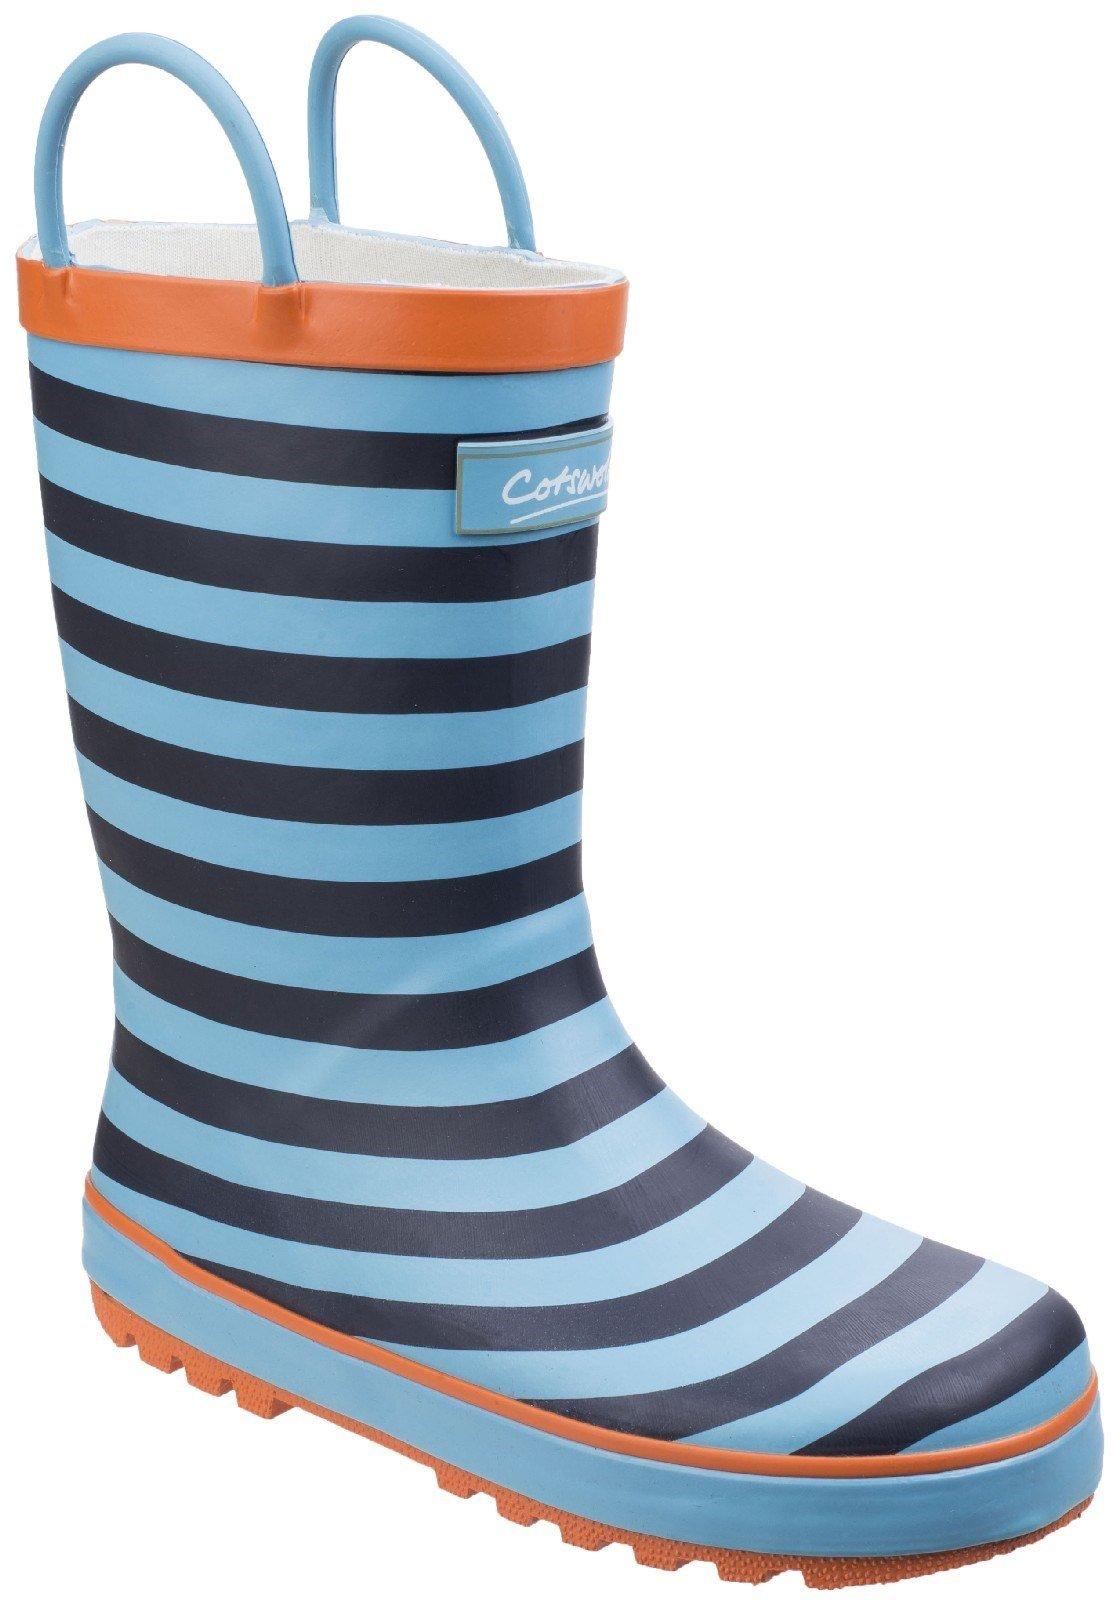 Cotswold Kids Captain Stripy Wellies Boot Blue 25545 - Blue 4.5